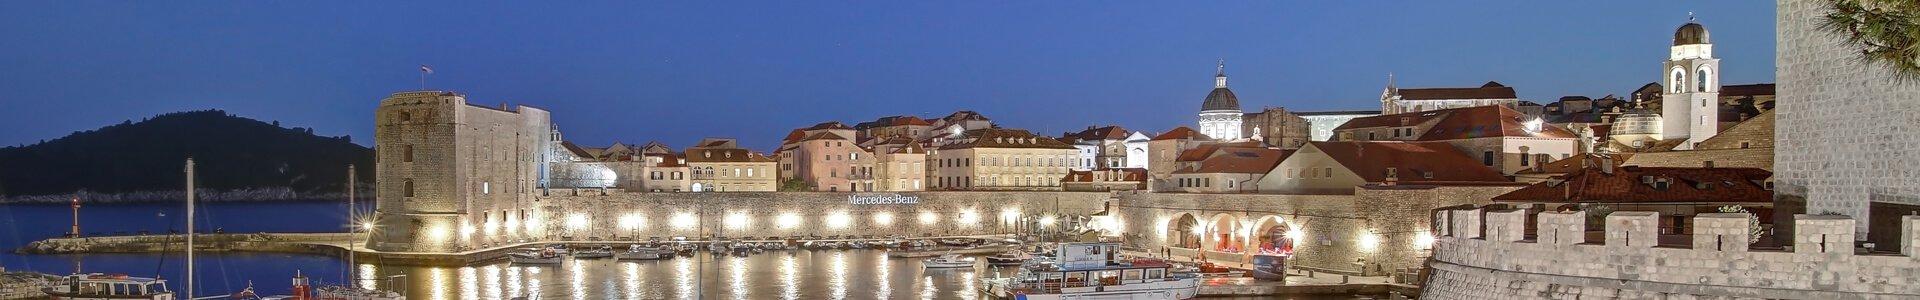 Dubrovnik DMC